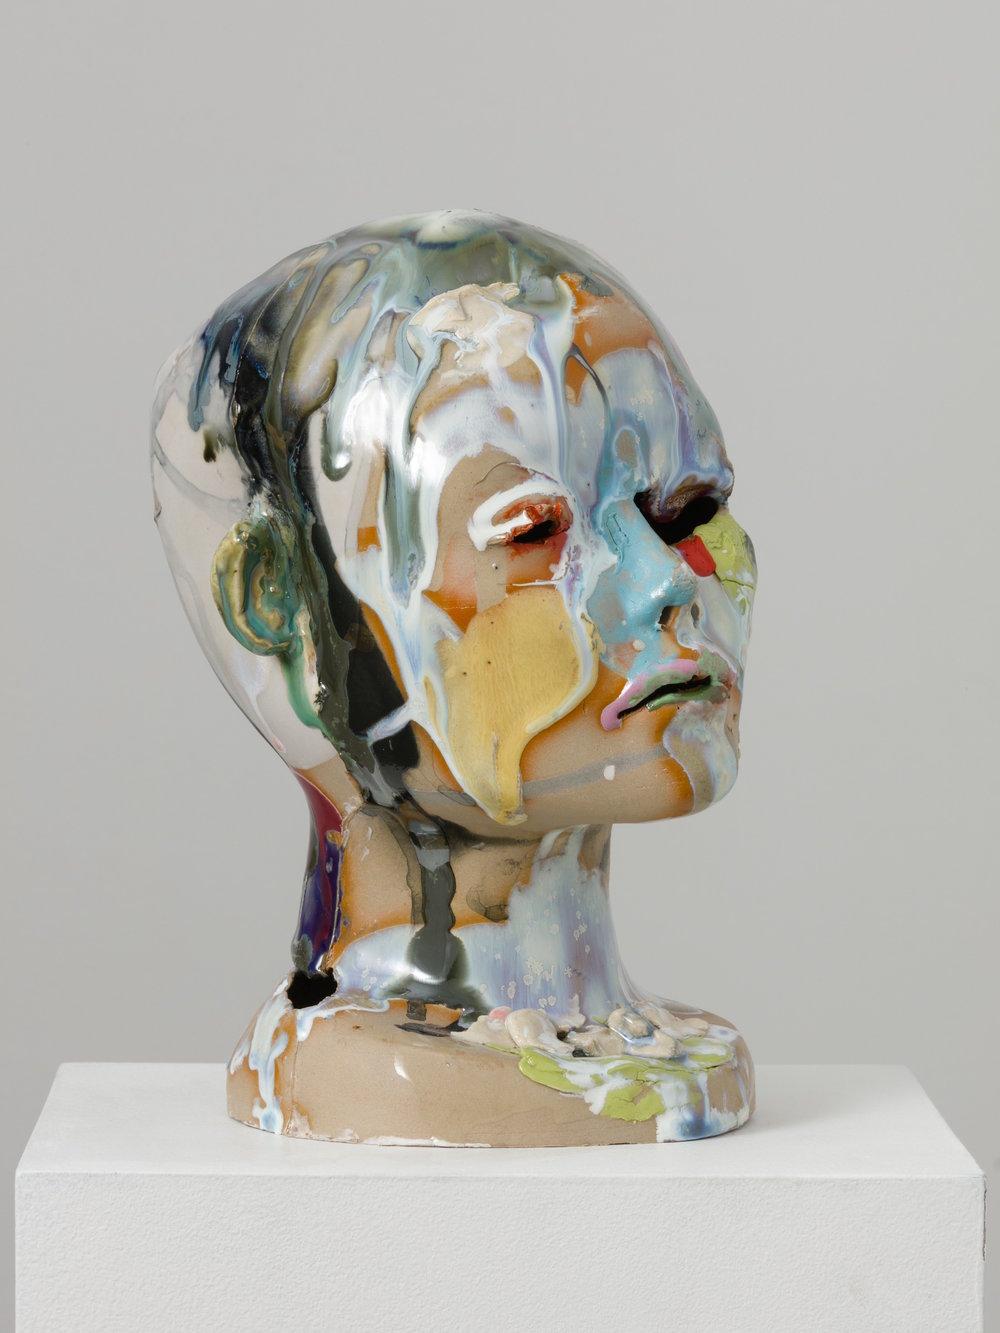 Jennie Jieun Lee, Untitled No. 28, 2016, stoneware slipcast, glaze, 10 x 6 x 6 in.